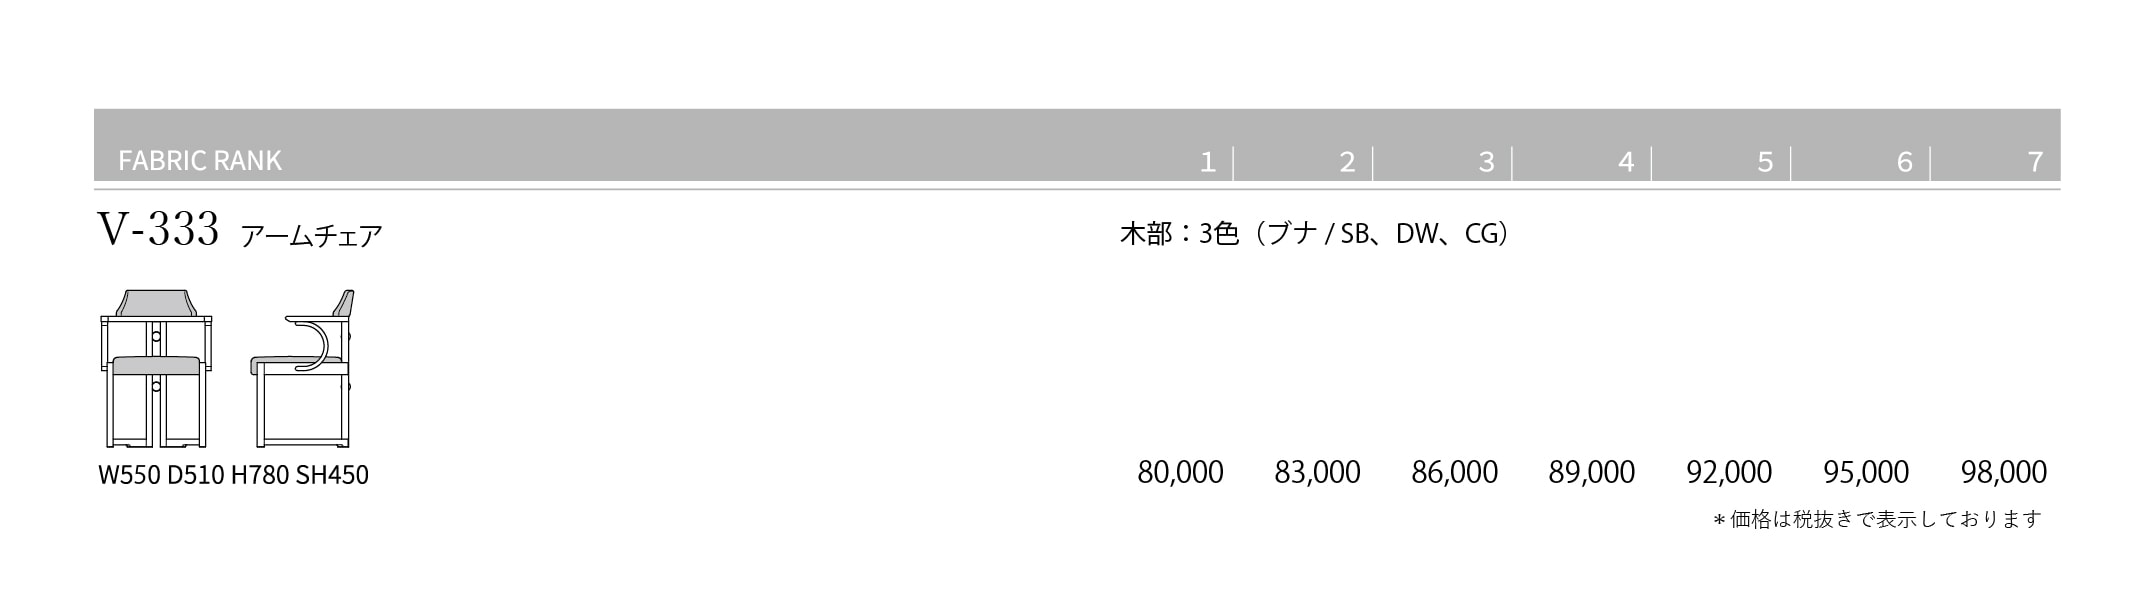 V-333 Price List